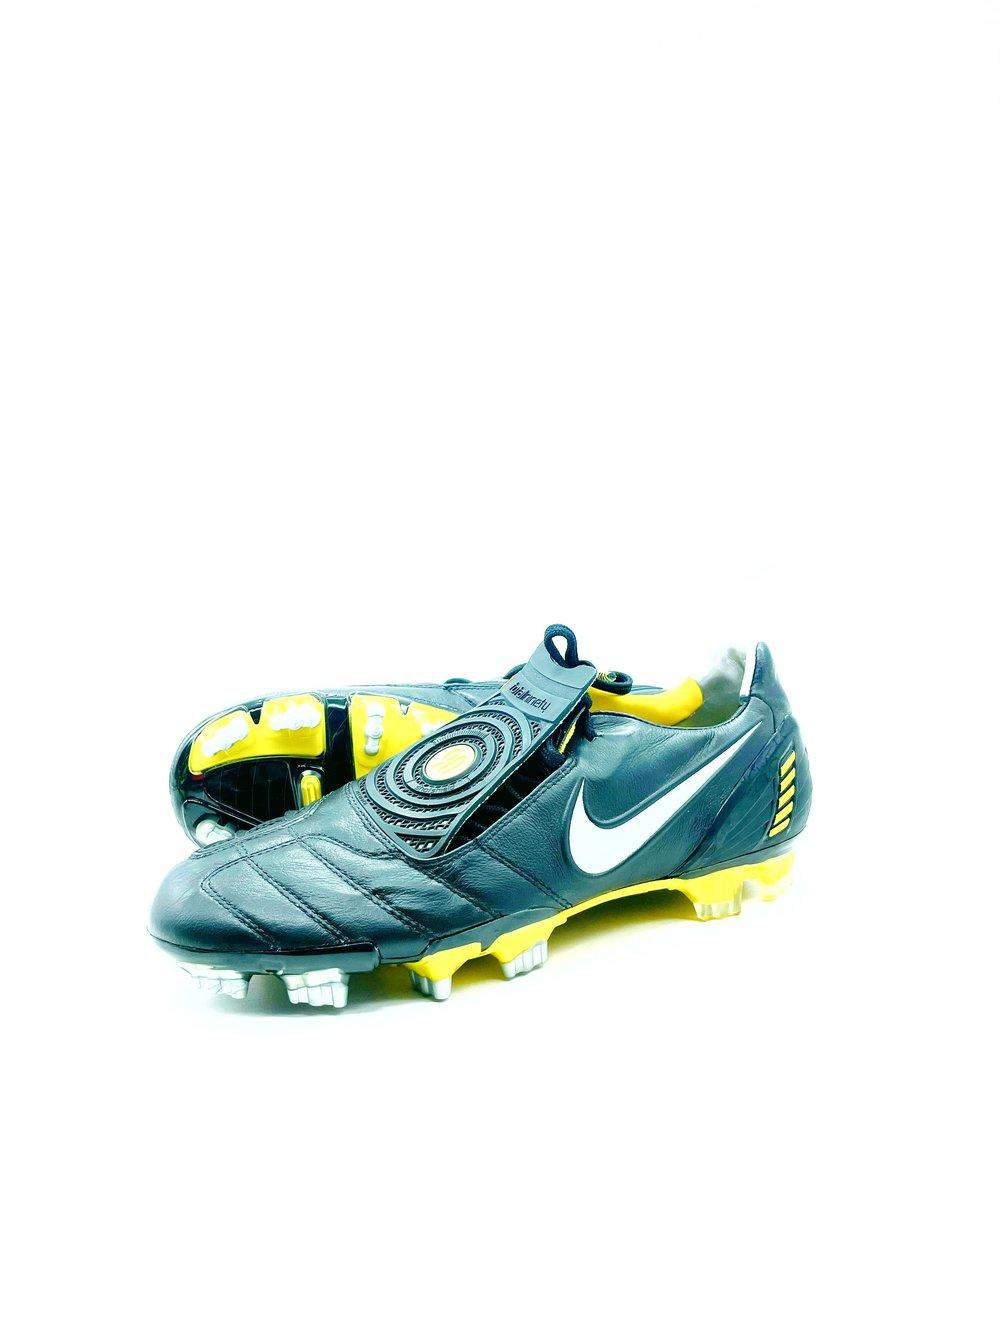 Image of Nike total 90 laser II FG k leather